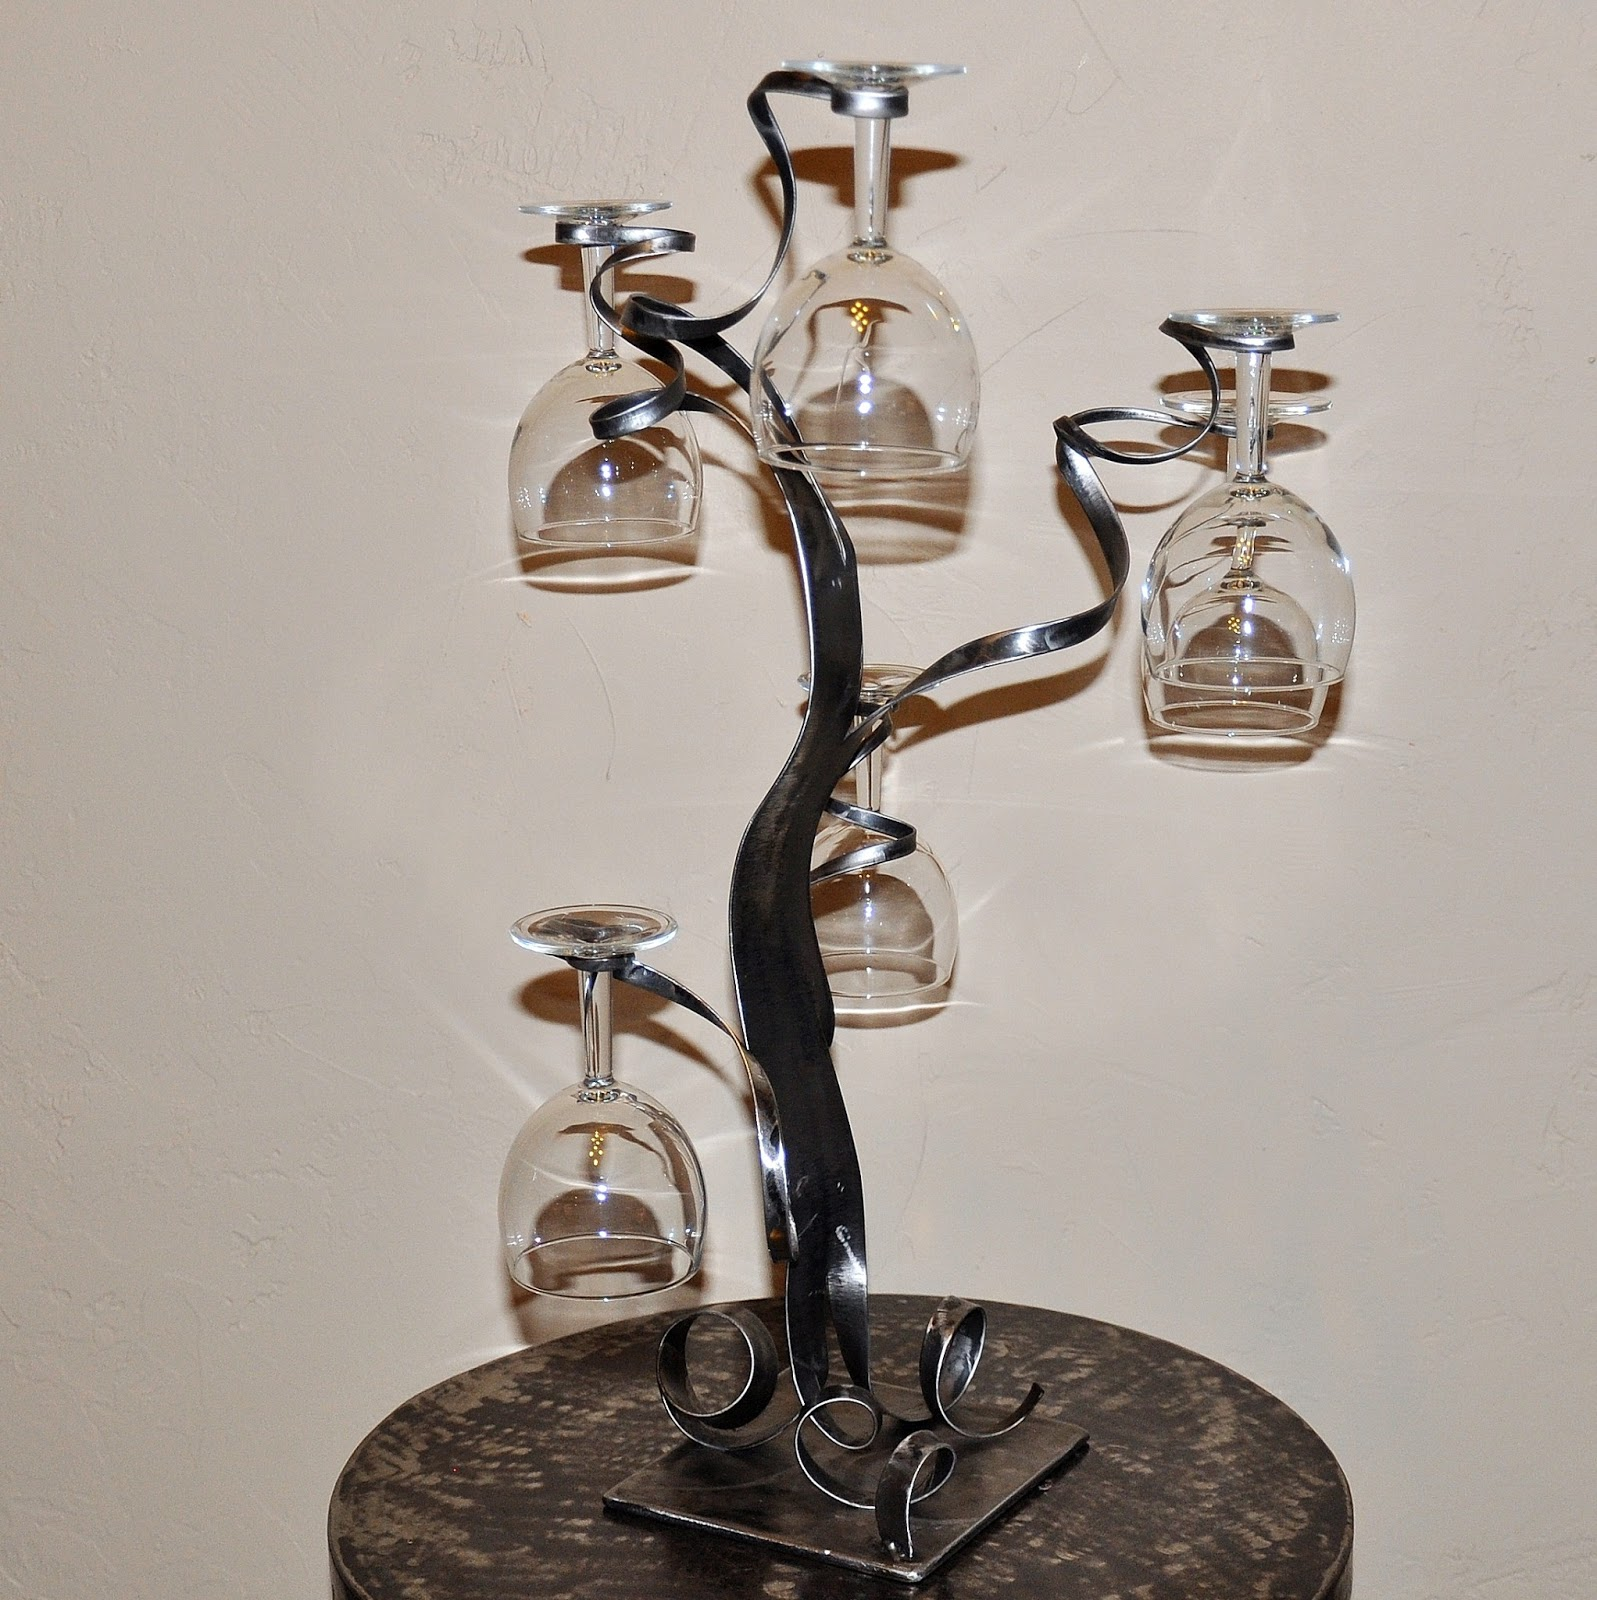 cr ateur d 39 objets d co en fer forg bougeoirs luminaires porte bouteille mai 2013. Black Bedroom Furniture Sets. Home Design Ideas